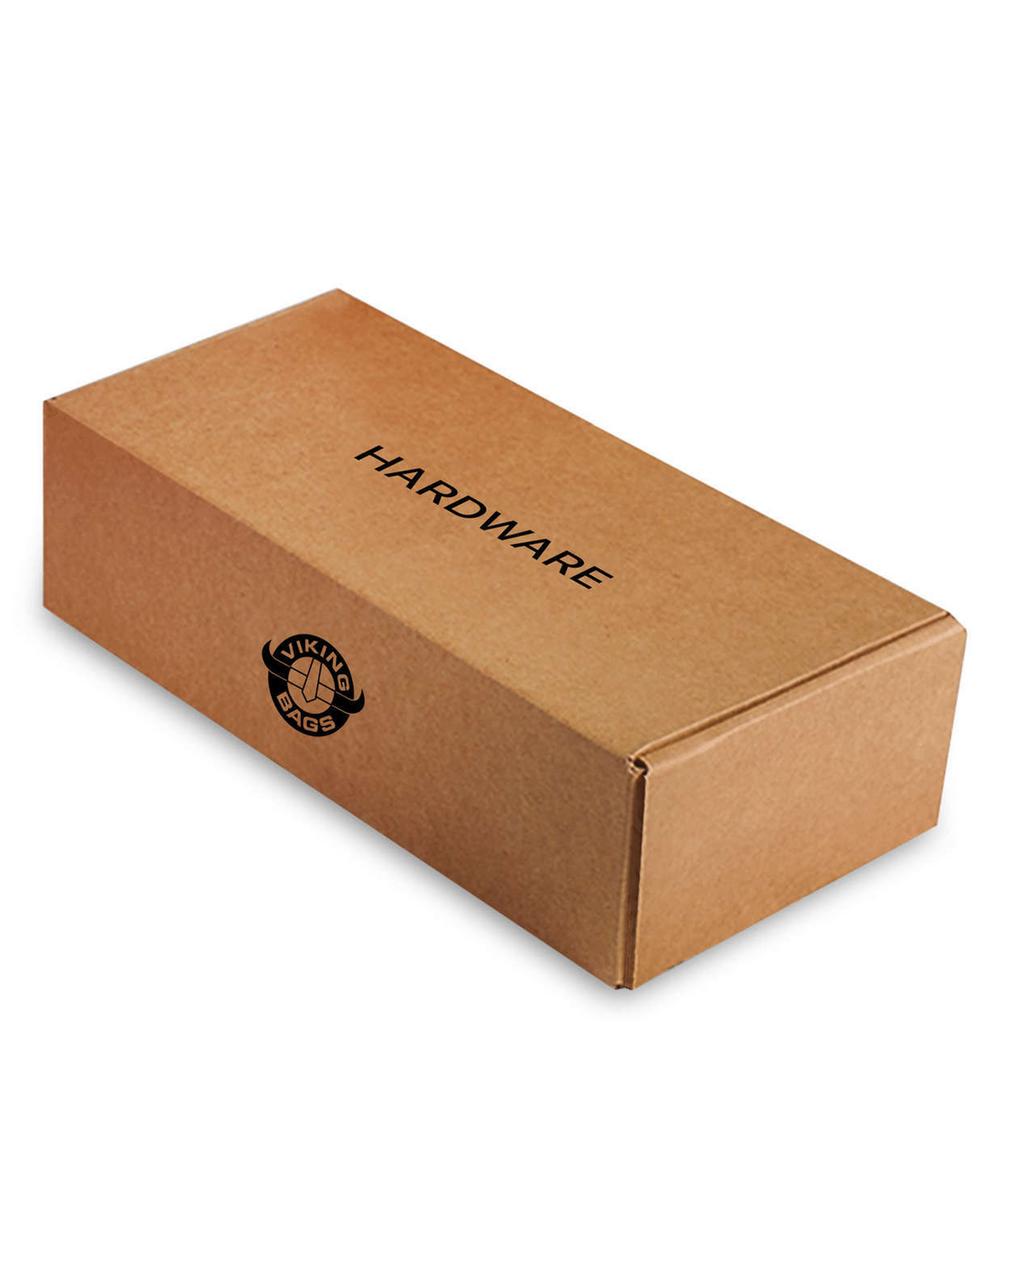 Honda 1500 Valkyrie Standard Warrior L Motorcycle saddlebags Box